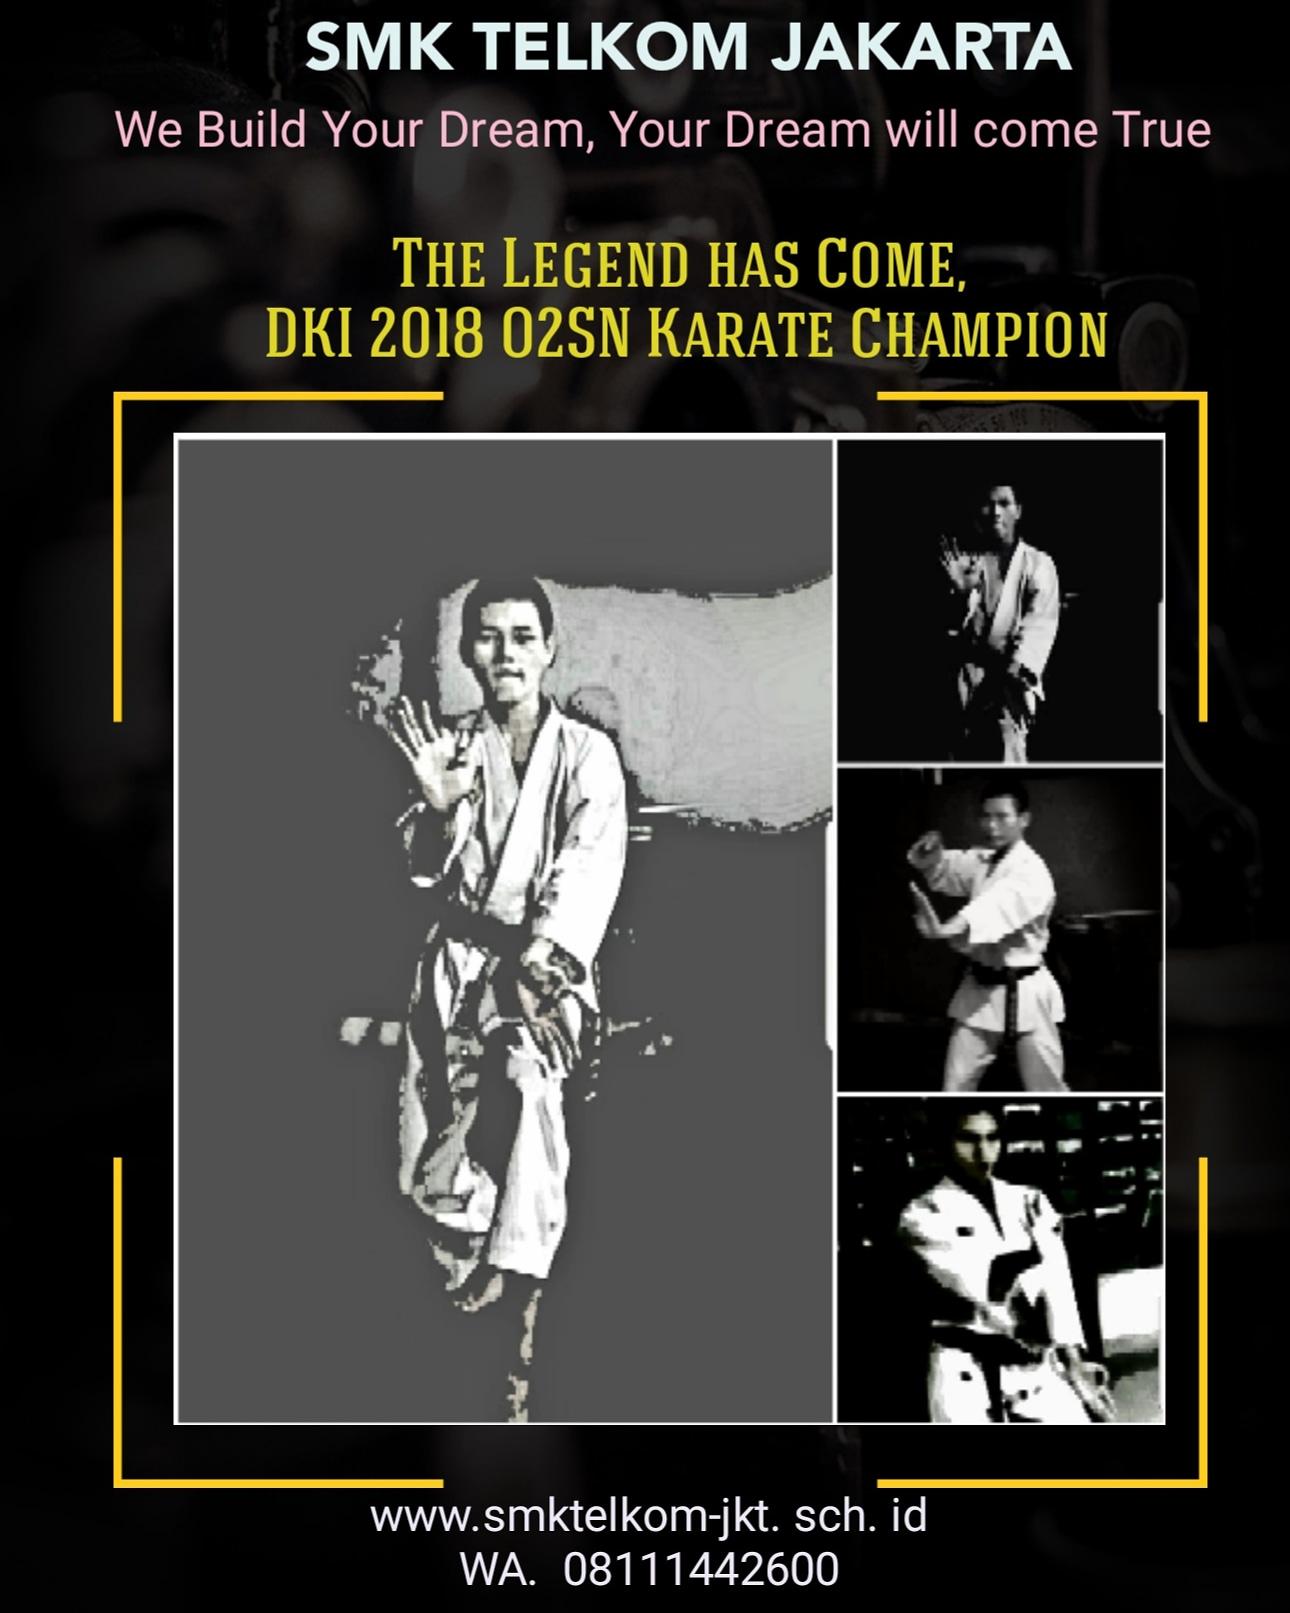 Indra DKI 2018 o2sn karate champion